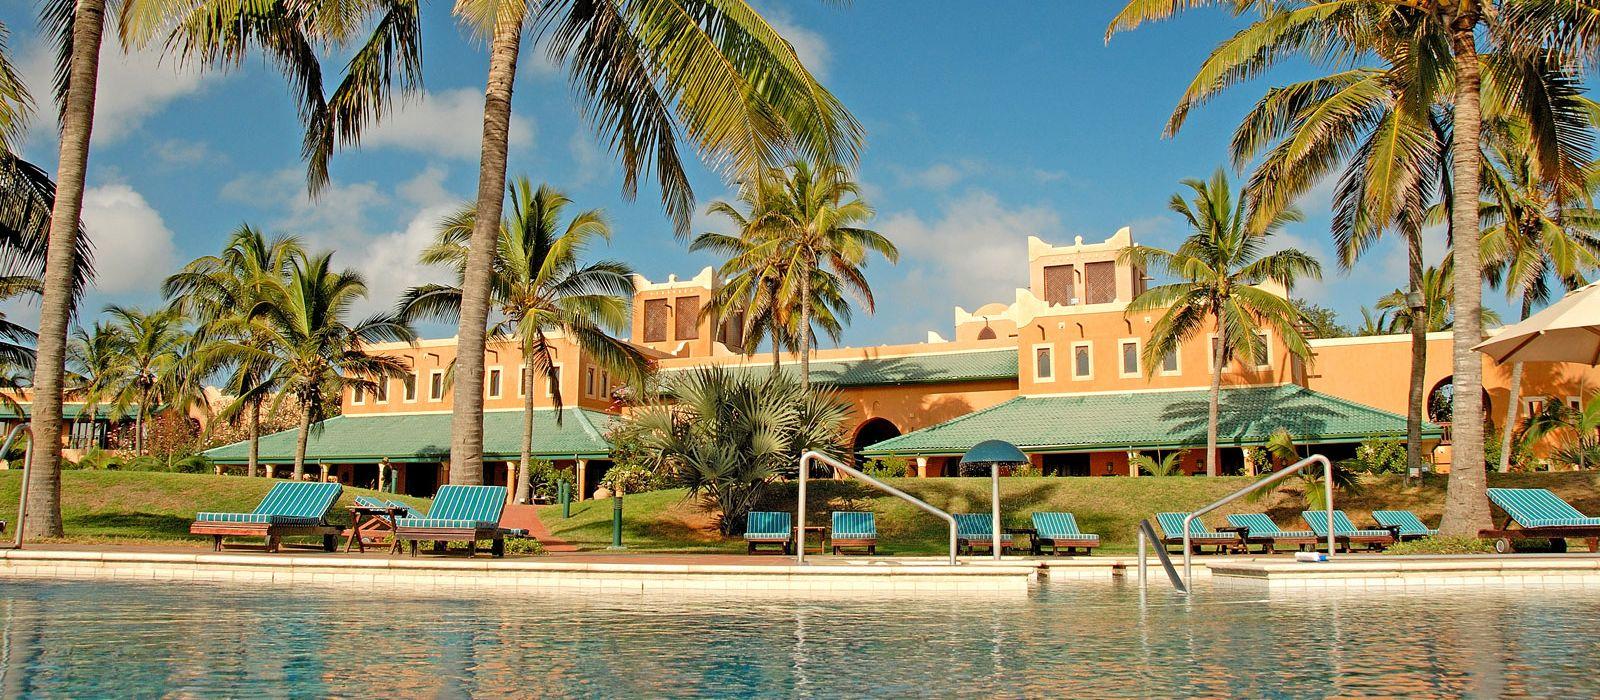 Hotel Pemba Beach  Mozambique